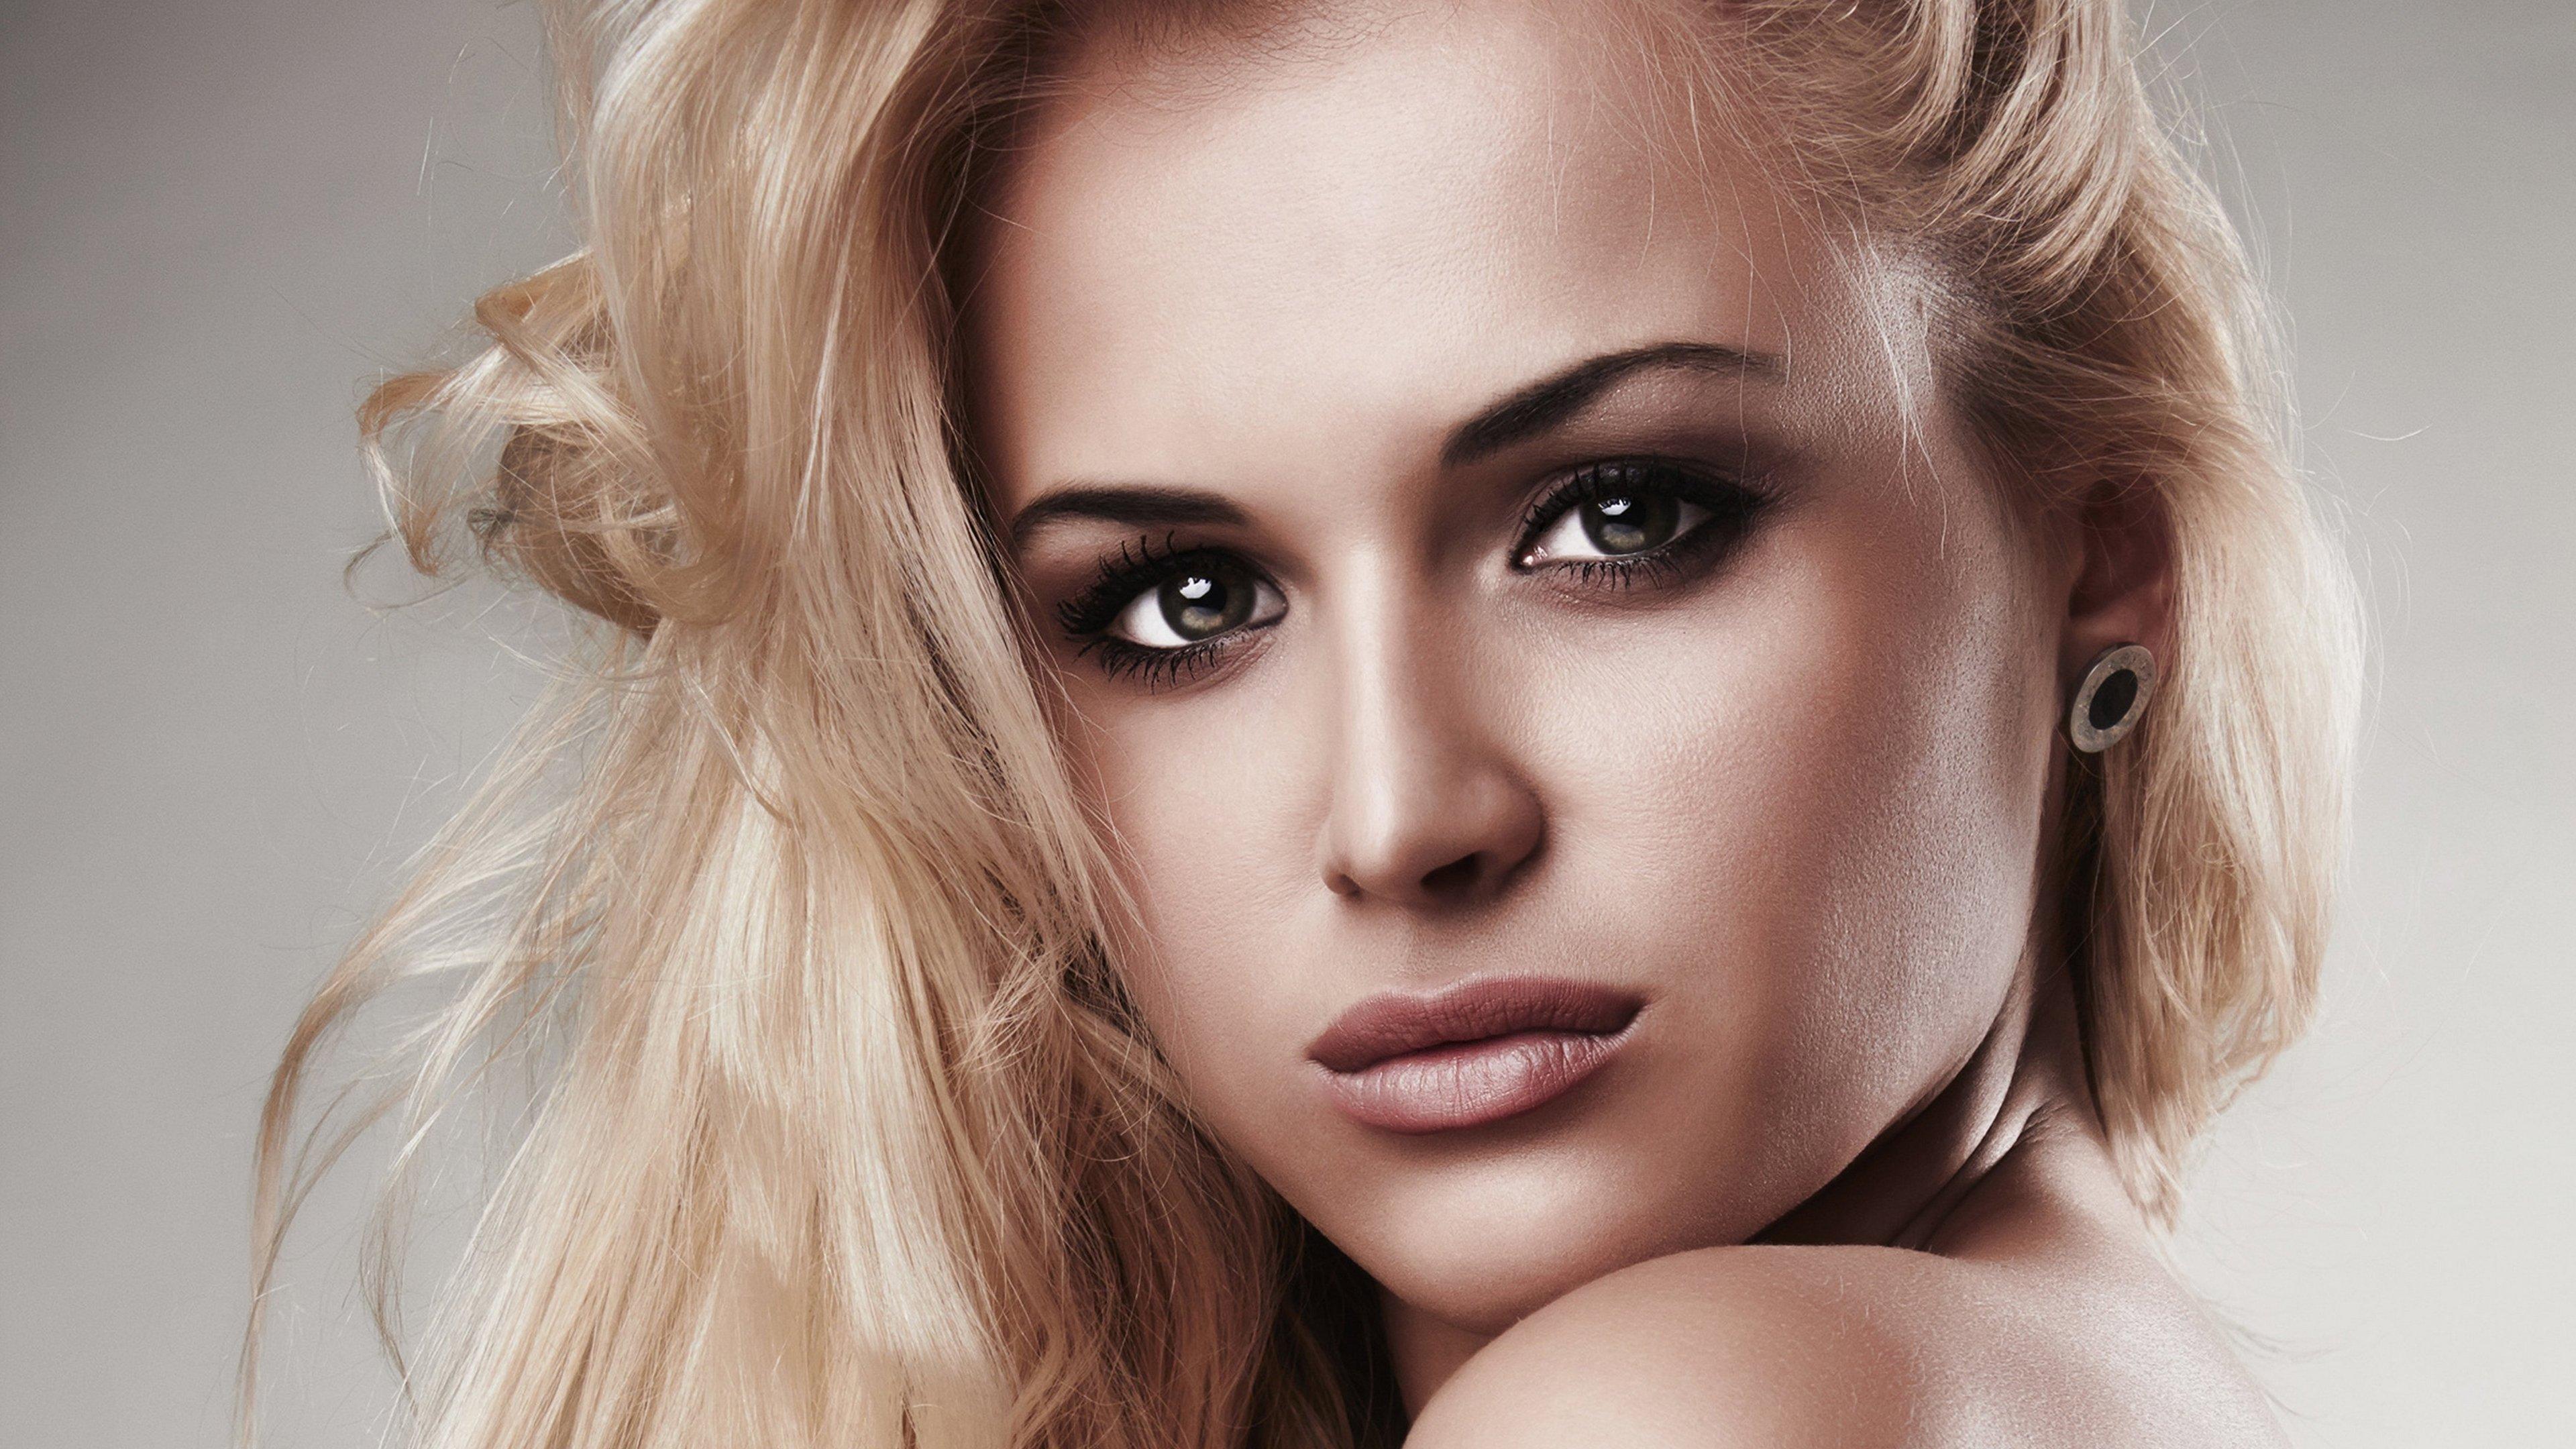 Pretty blonde girls women beautiful blondes wallpaper